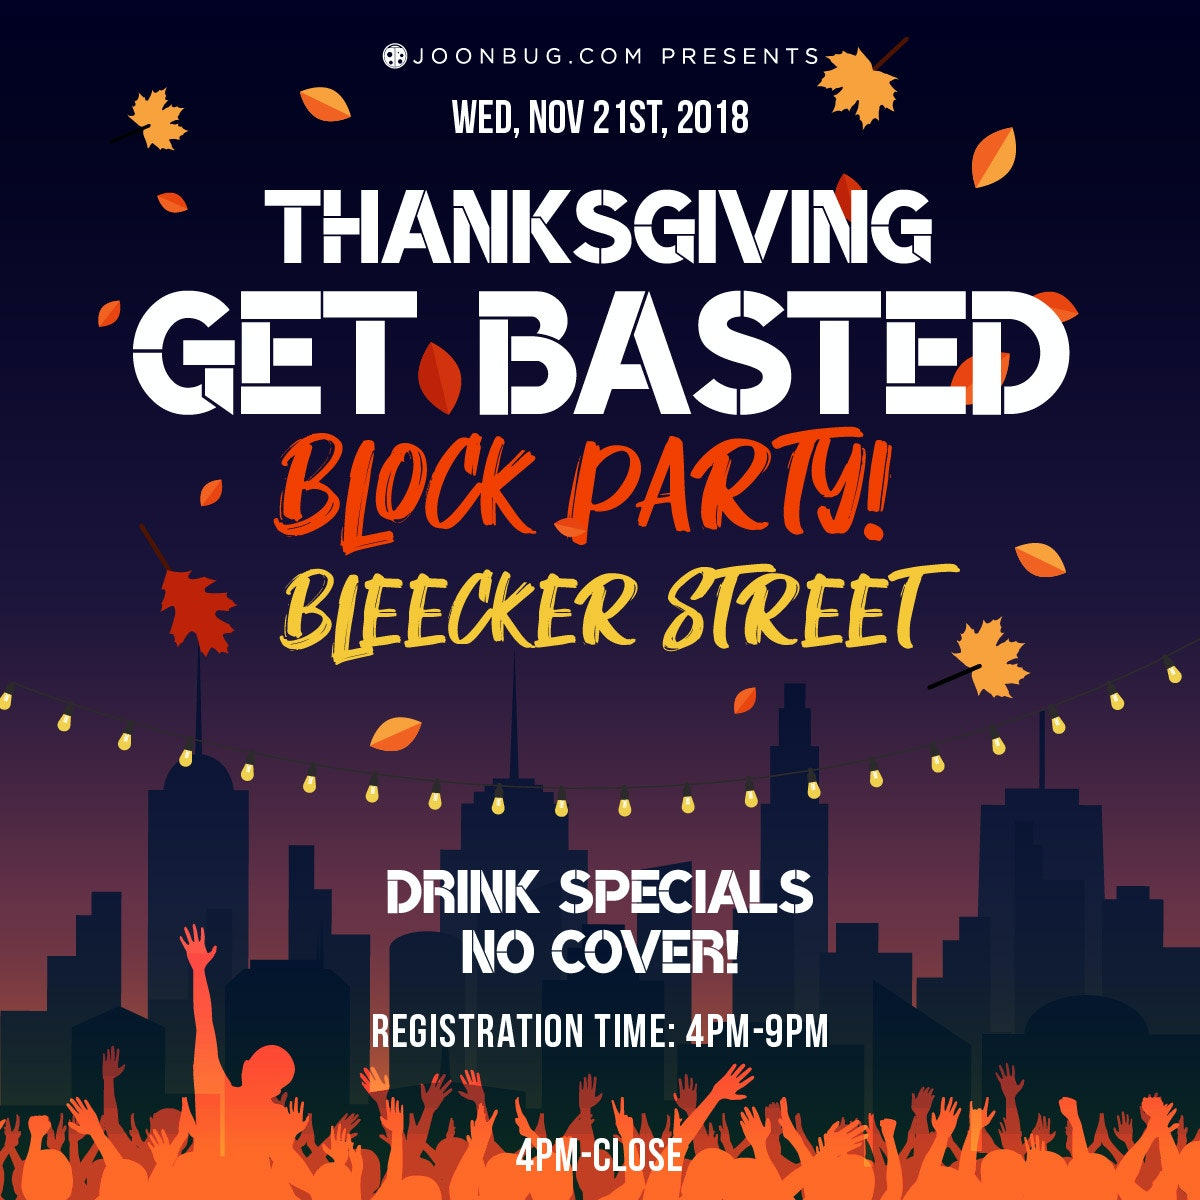 Bleeker St - Thanksgiving Eve Block Party